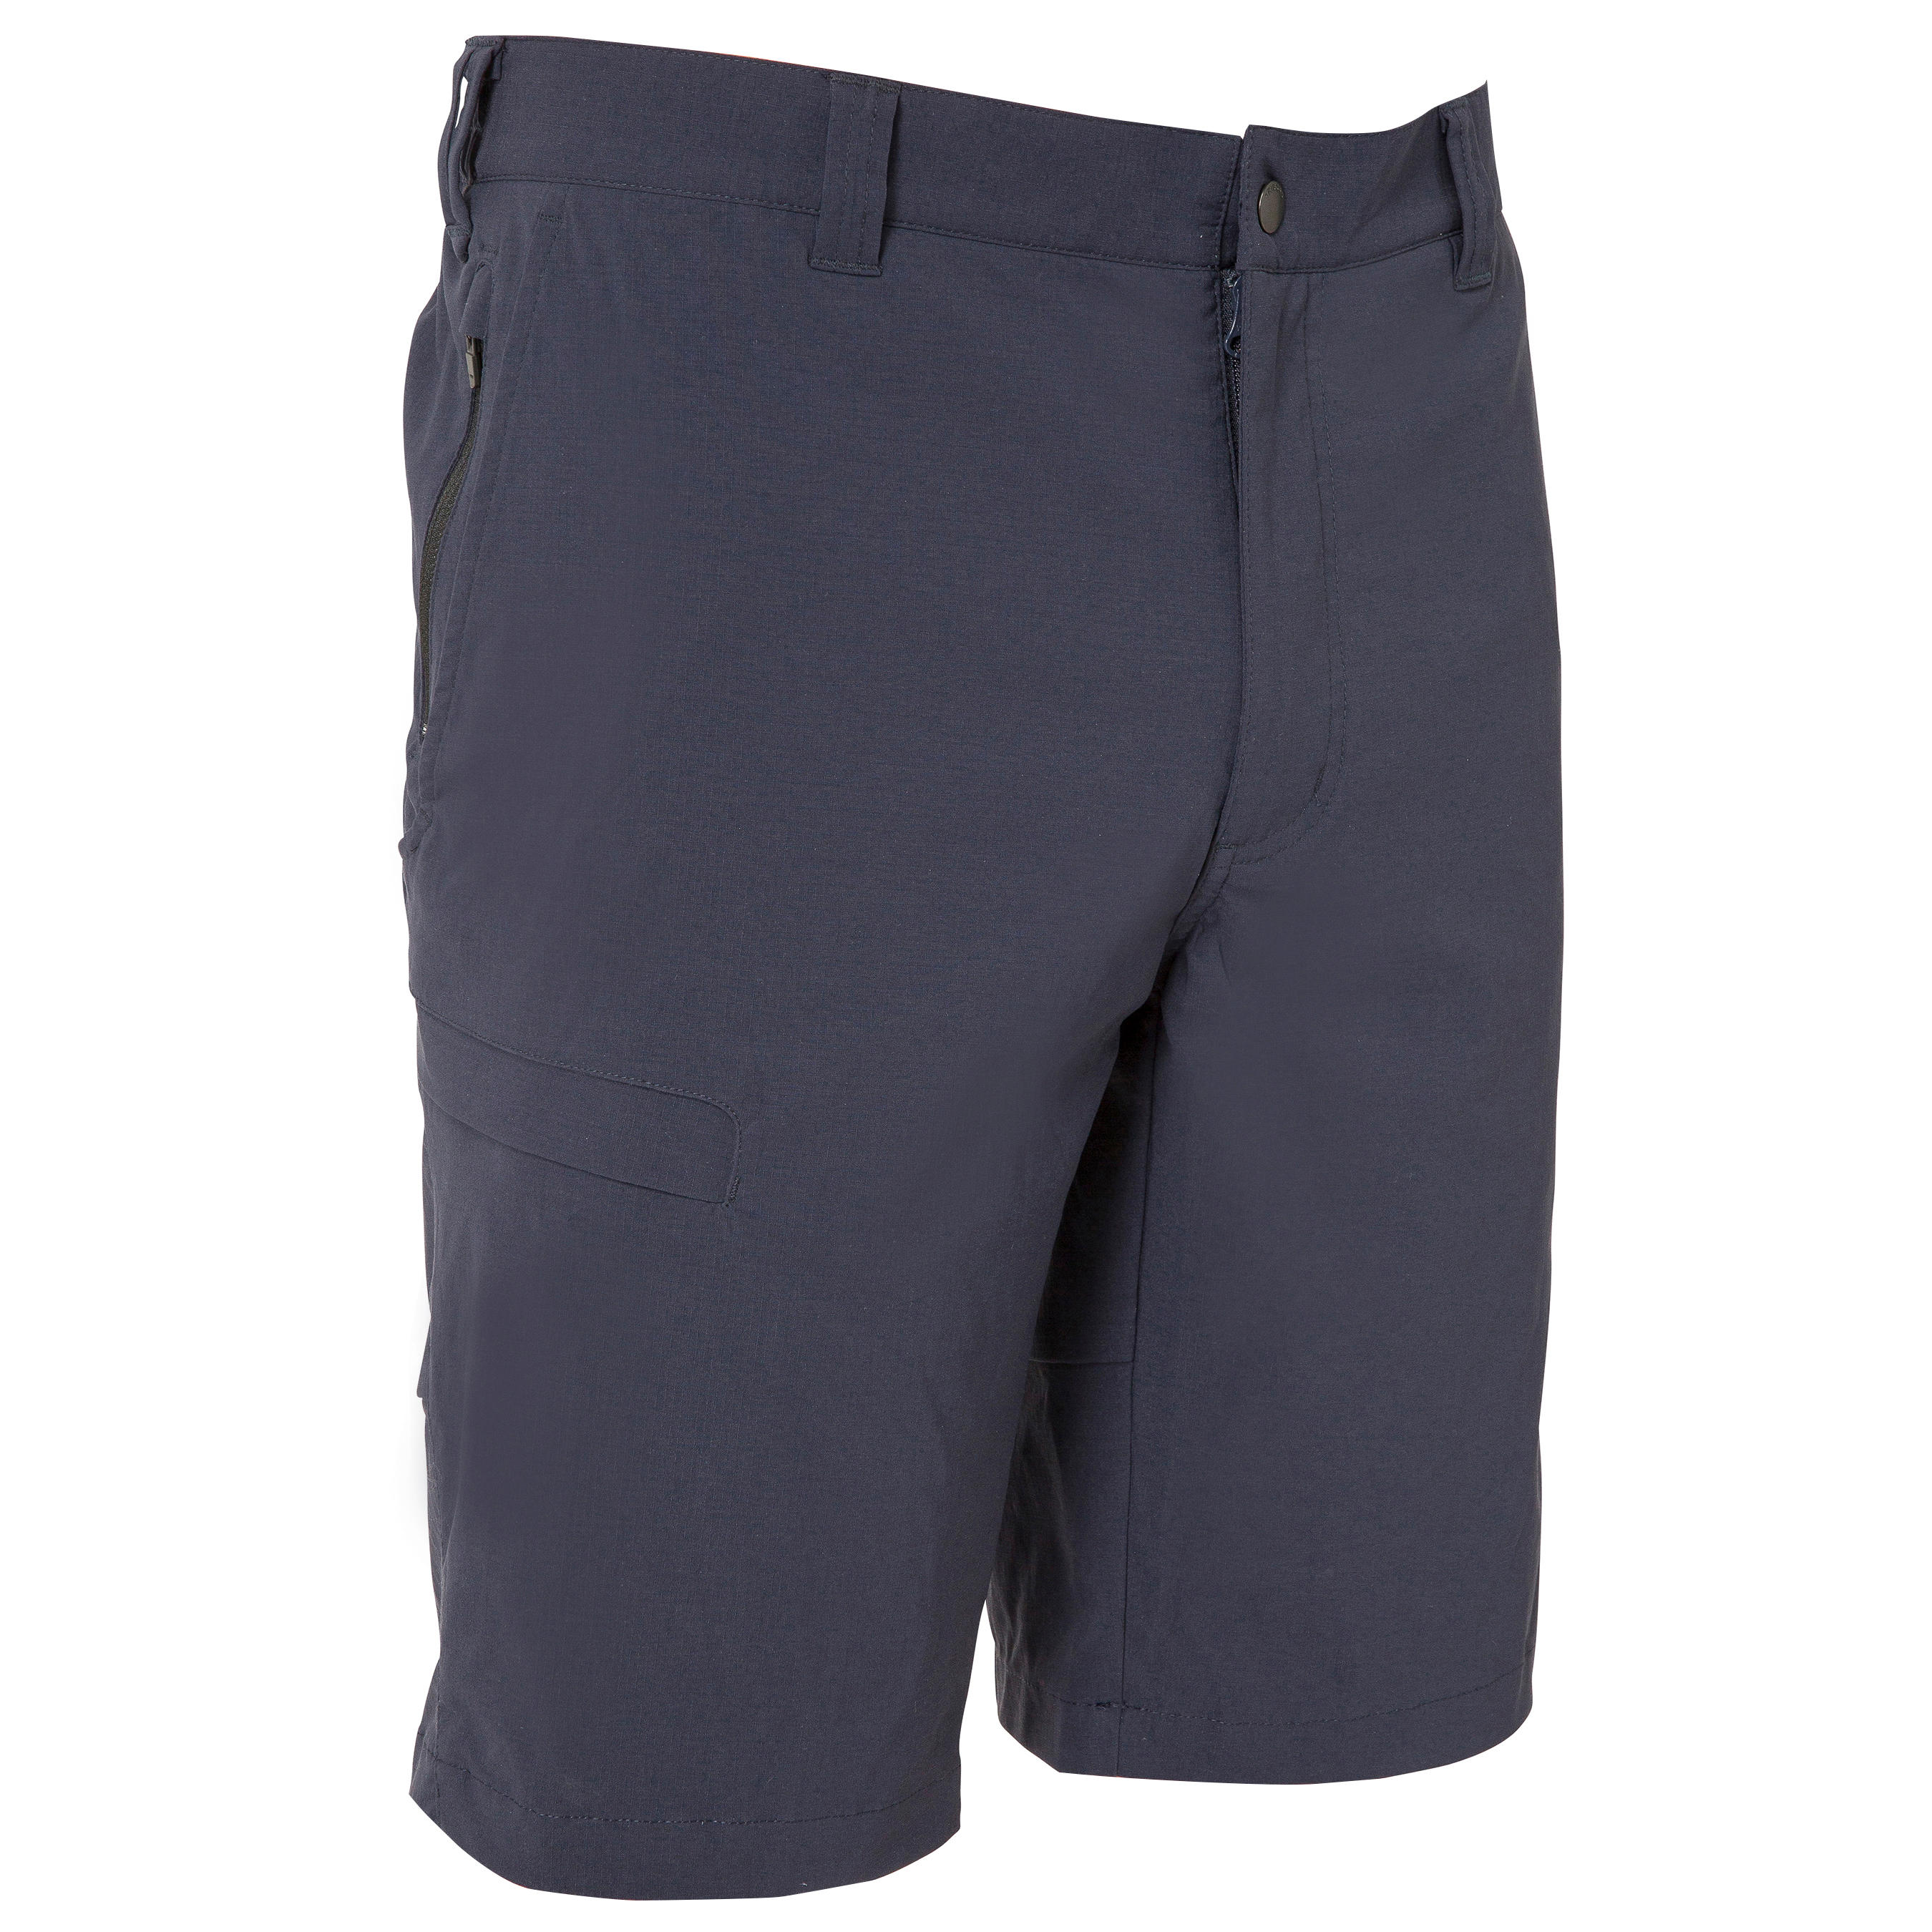 Bermuda shorts for...